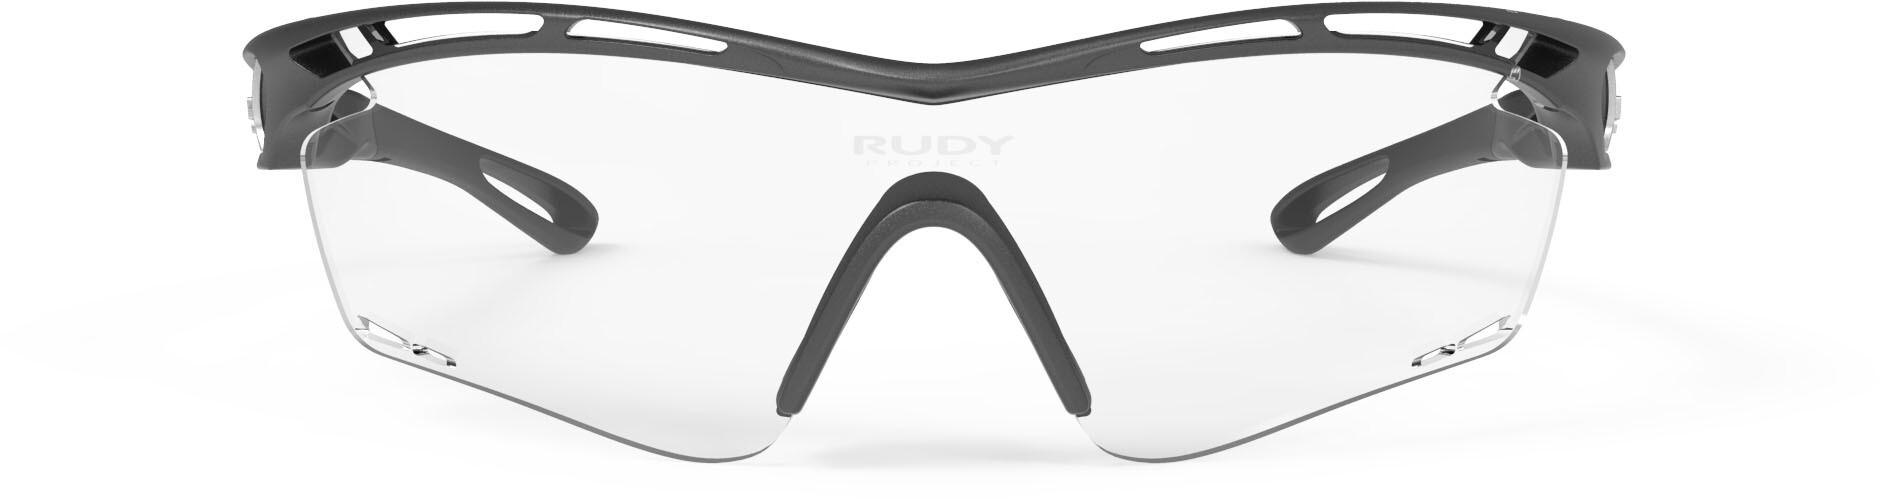 f4ef6a01f41 Rudy Project Tralyx Graphene Bike Glasses grey at Bikester.co.uk